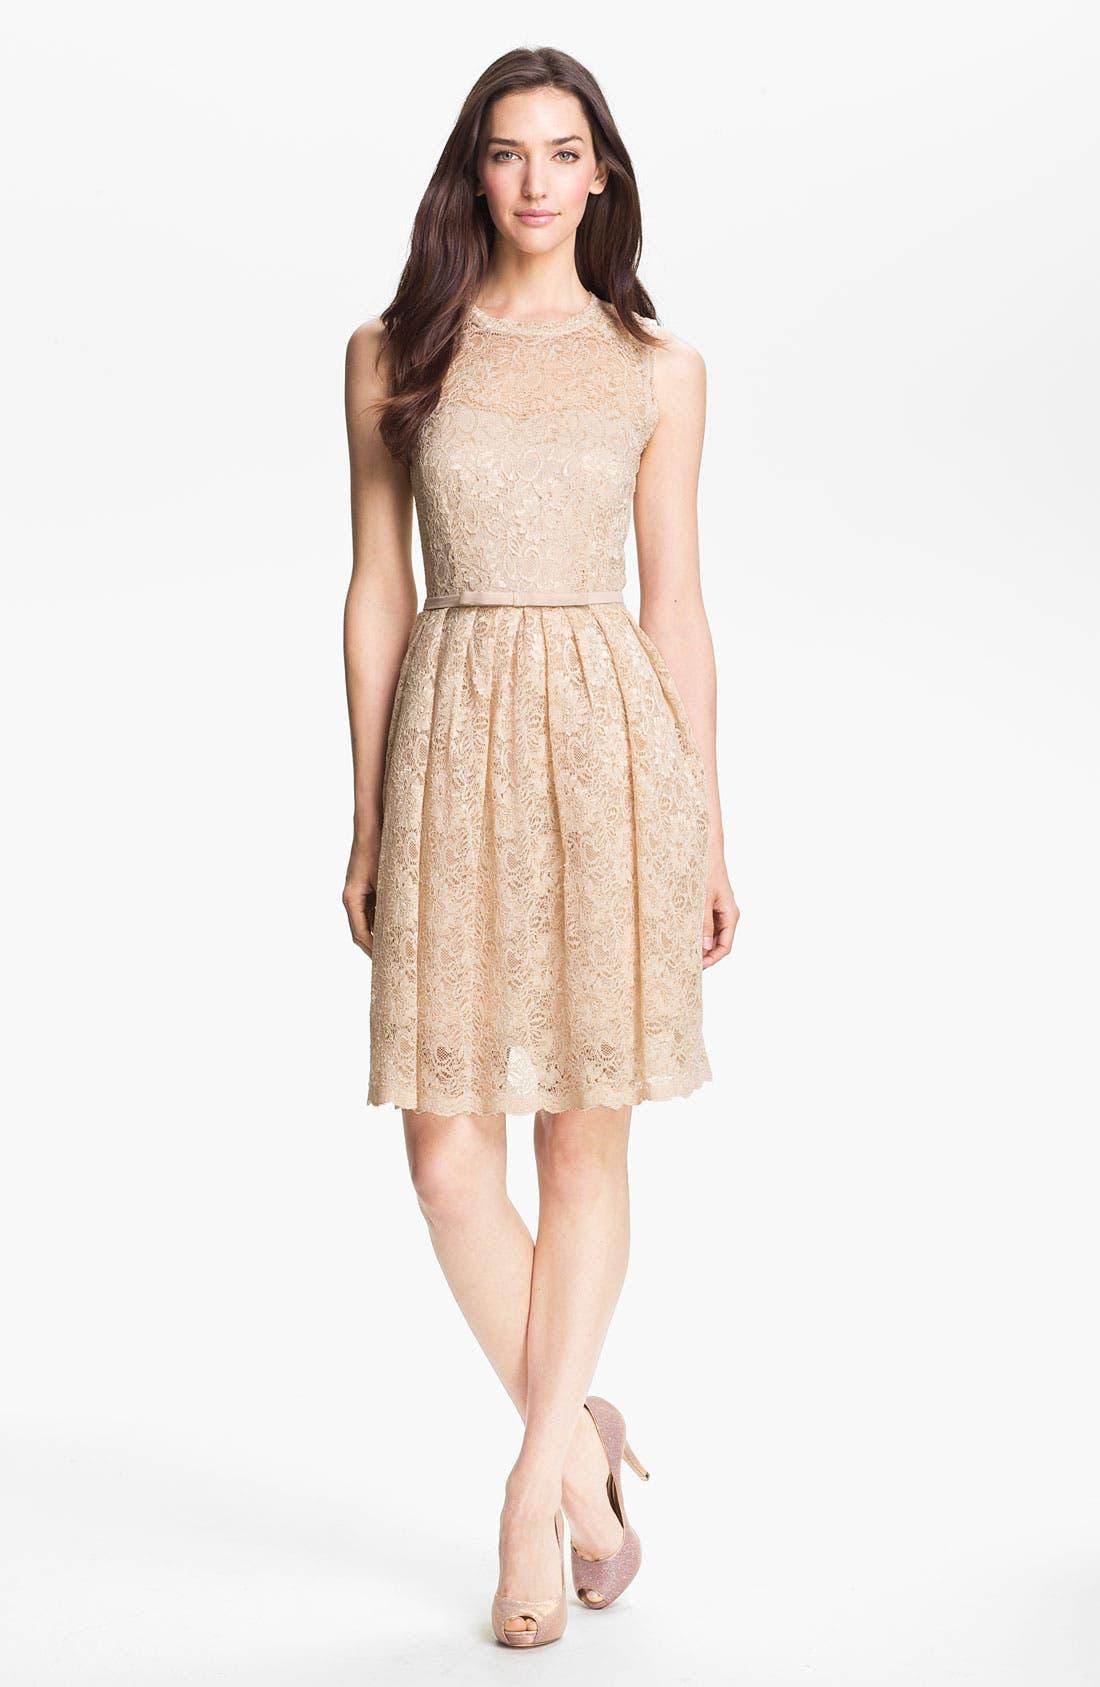 Alternate Image 1 Selected - Taylor Dresses Illusion Yoke Lace Fit & Flare Dress